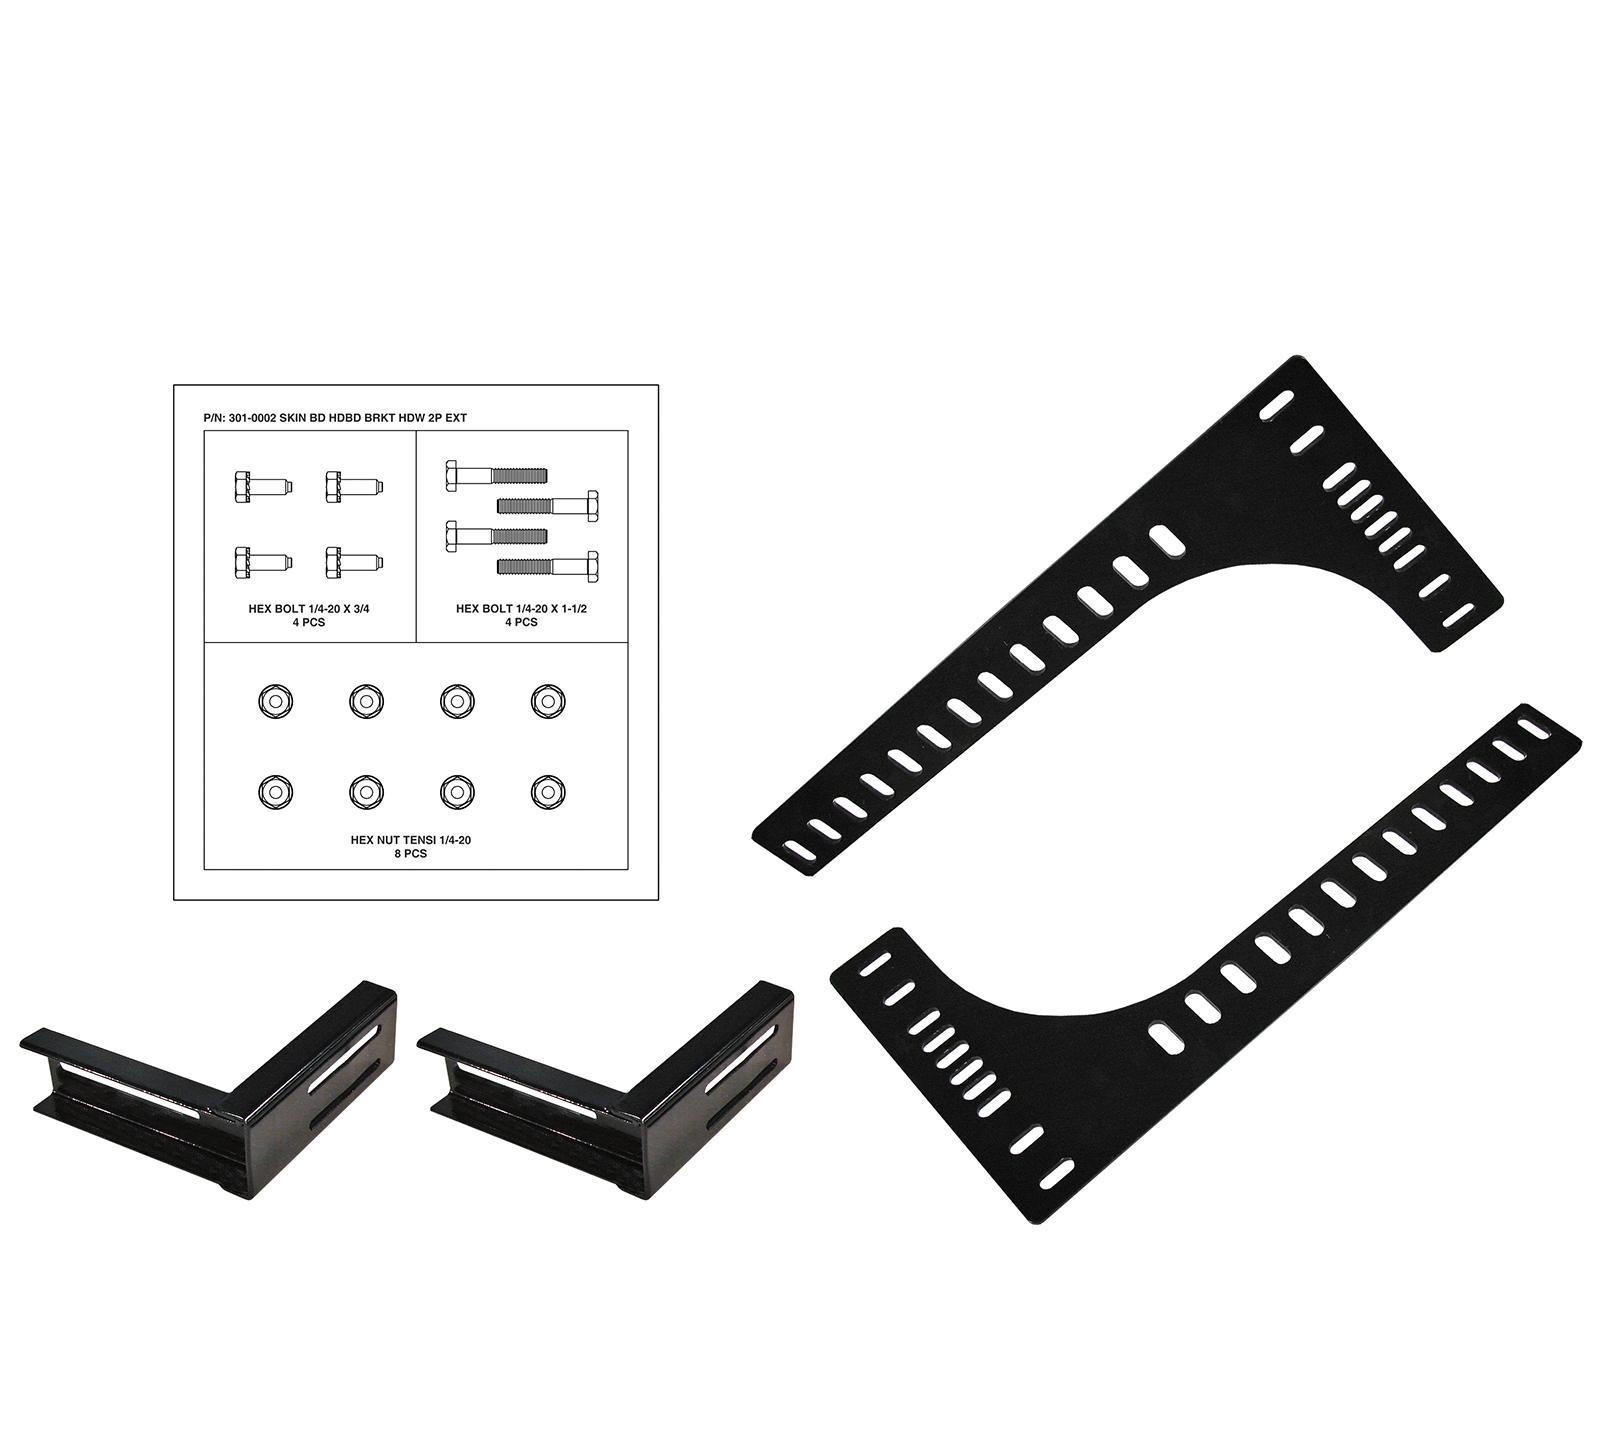 Leggett and Platt 100 Series Headboard Bracket 100 500 700 Series Headboard Bracket